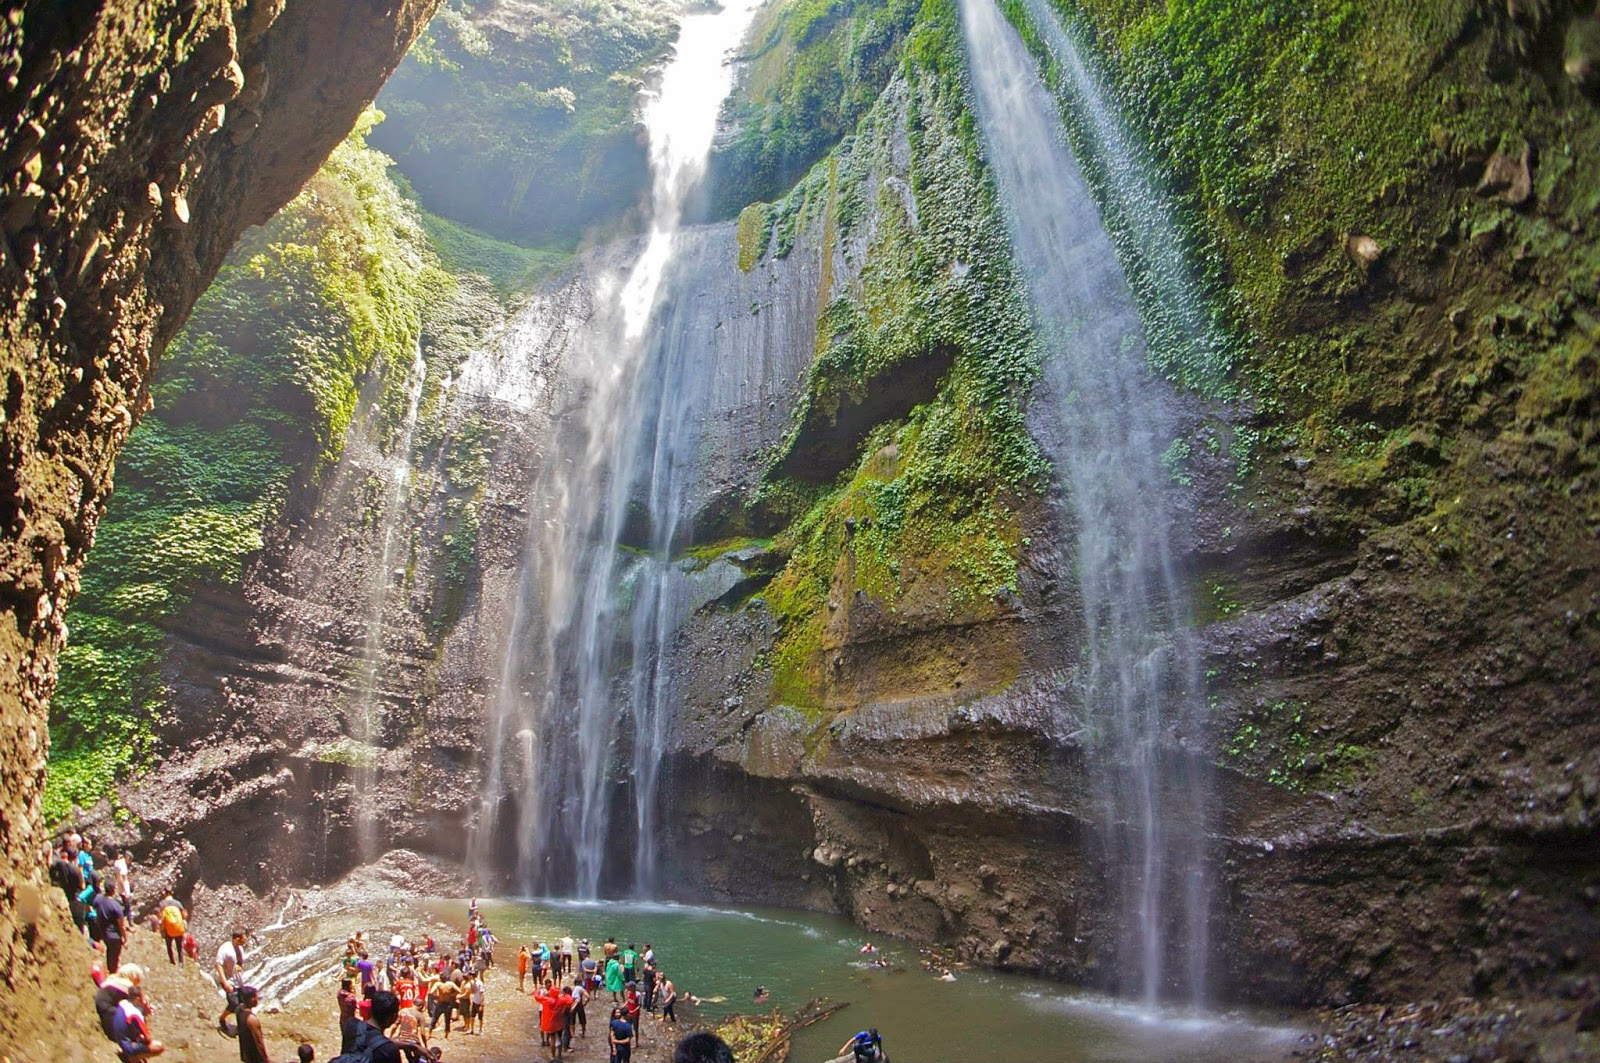 Air Terjun Madakaripura - Lumbang - Probolinggo - Jawa Timur